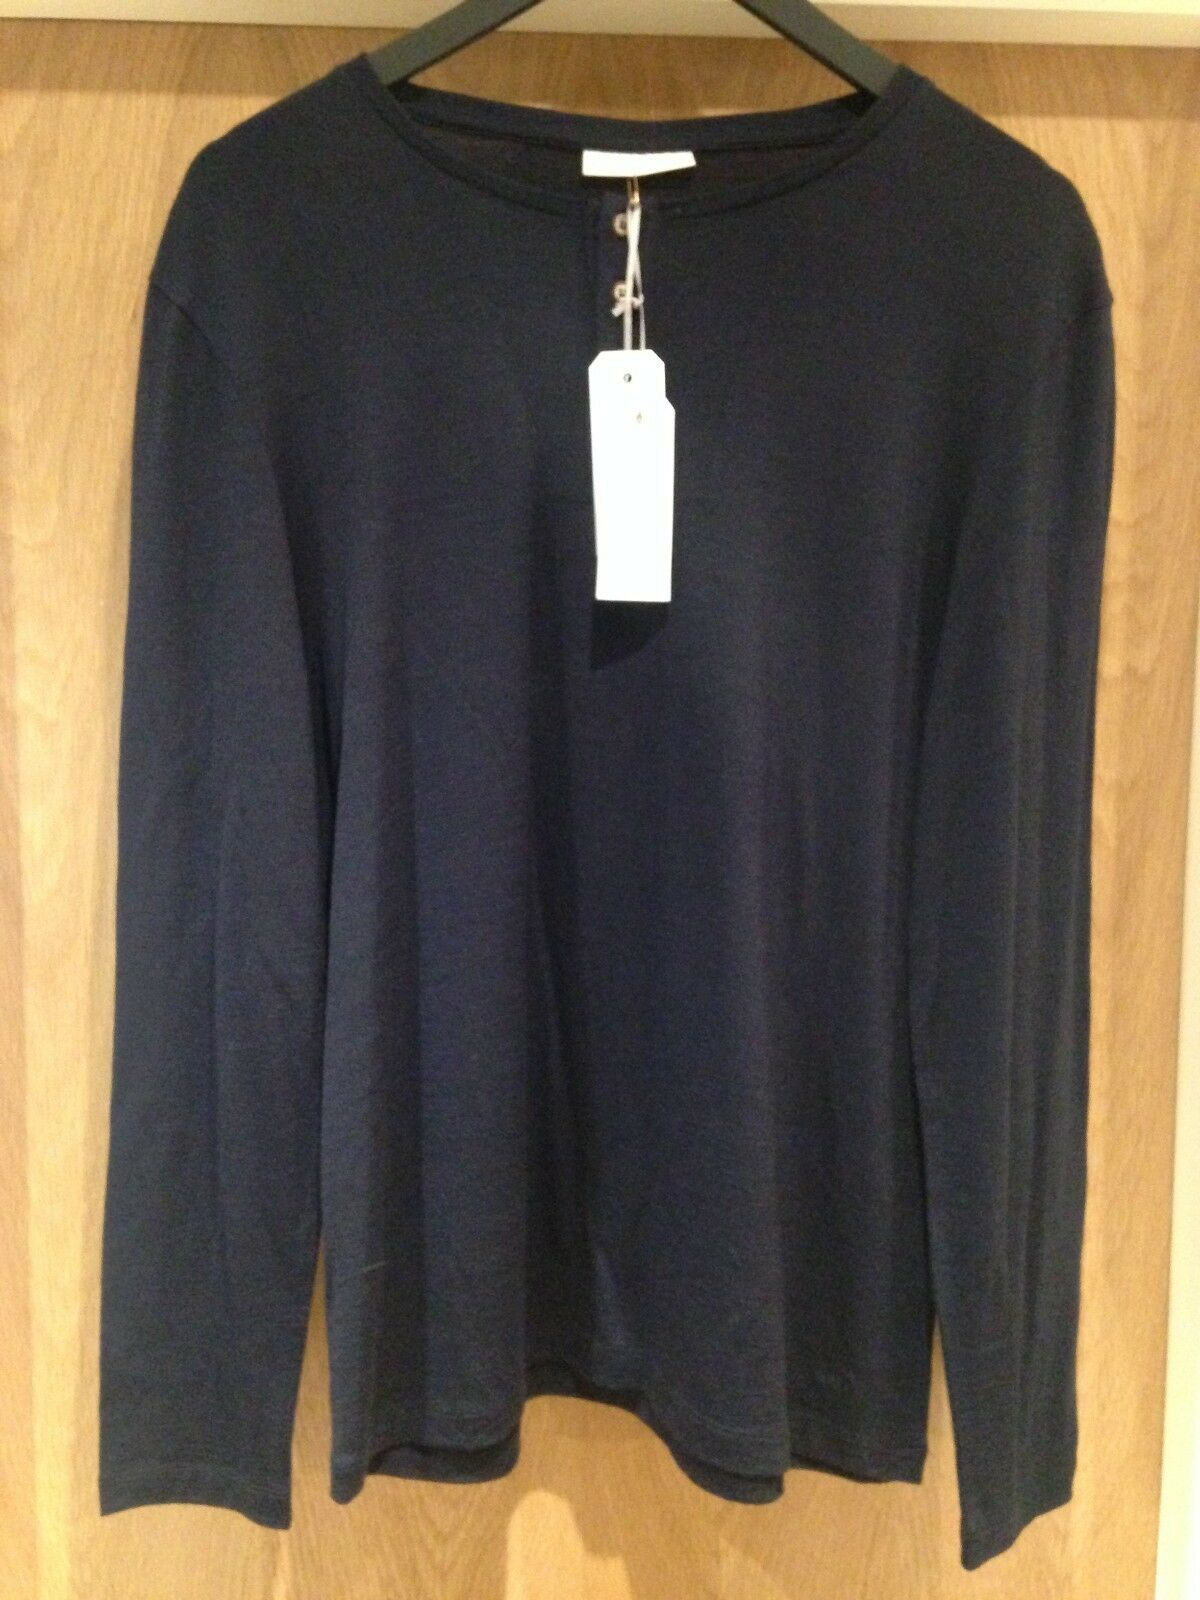 Designer King Tuckfield Woman's Large Navy Blau Long Sleeve T-Shirt BNWT RRP